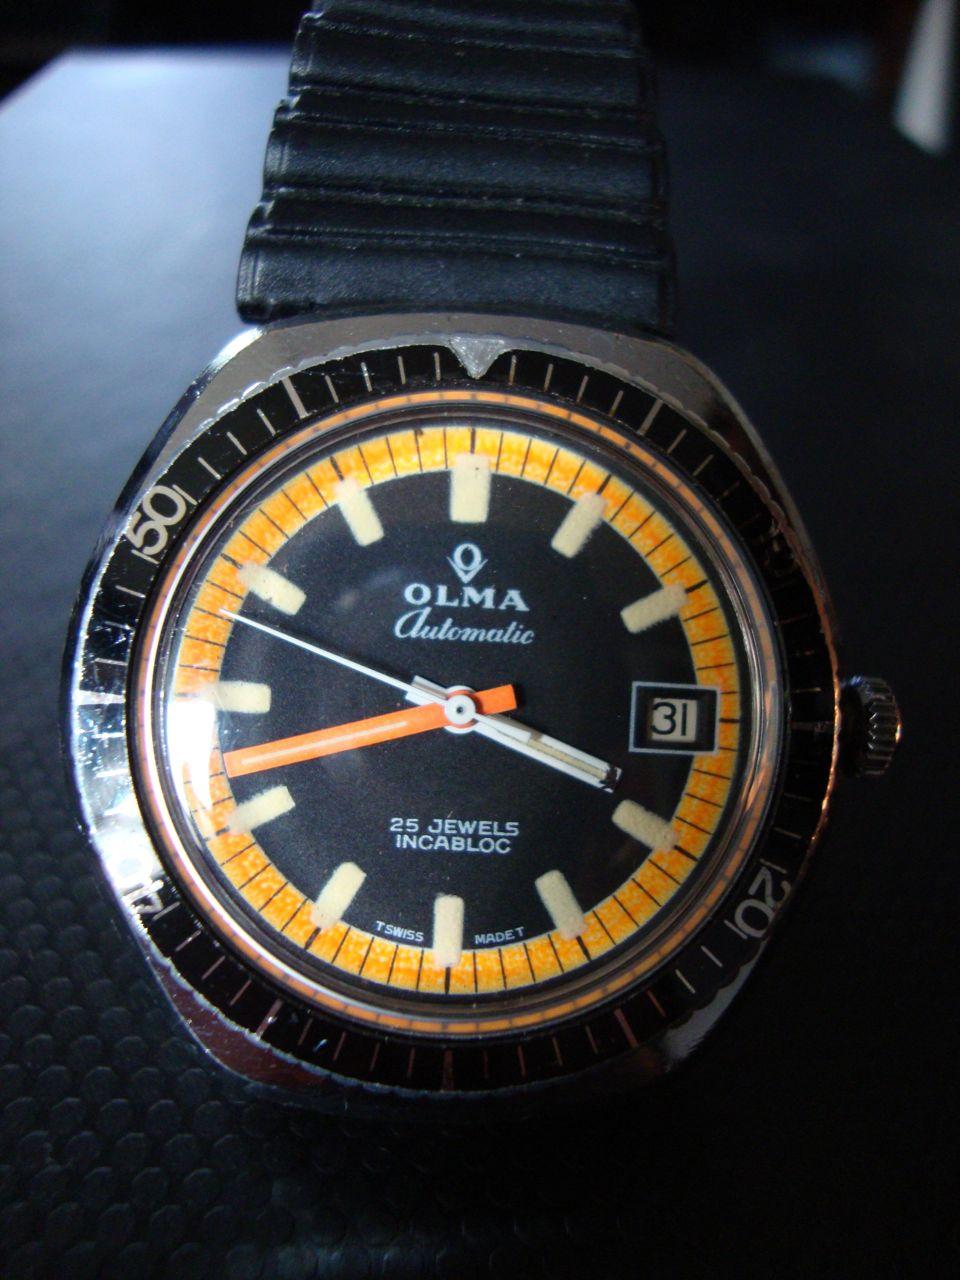 La vintage time olma black and orange diver - Orange dive watch ...